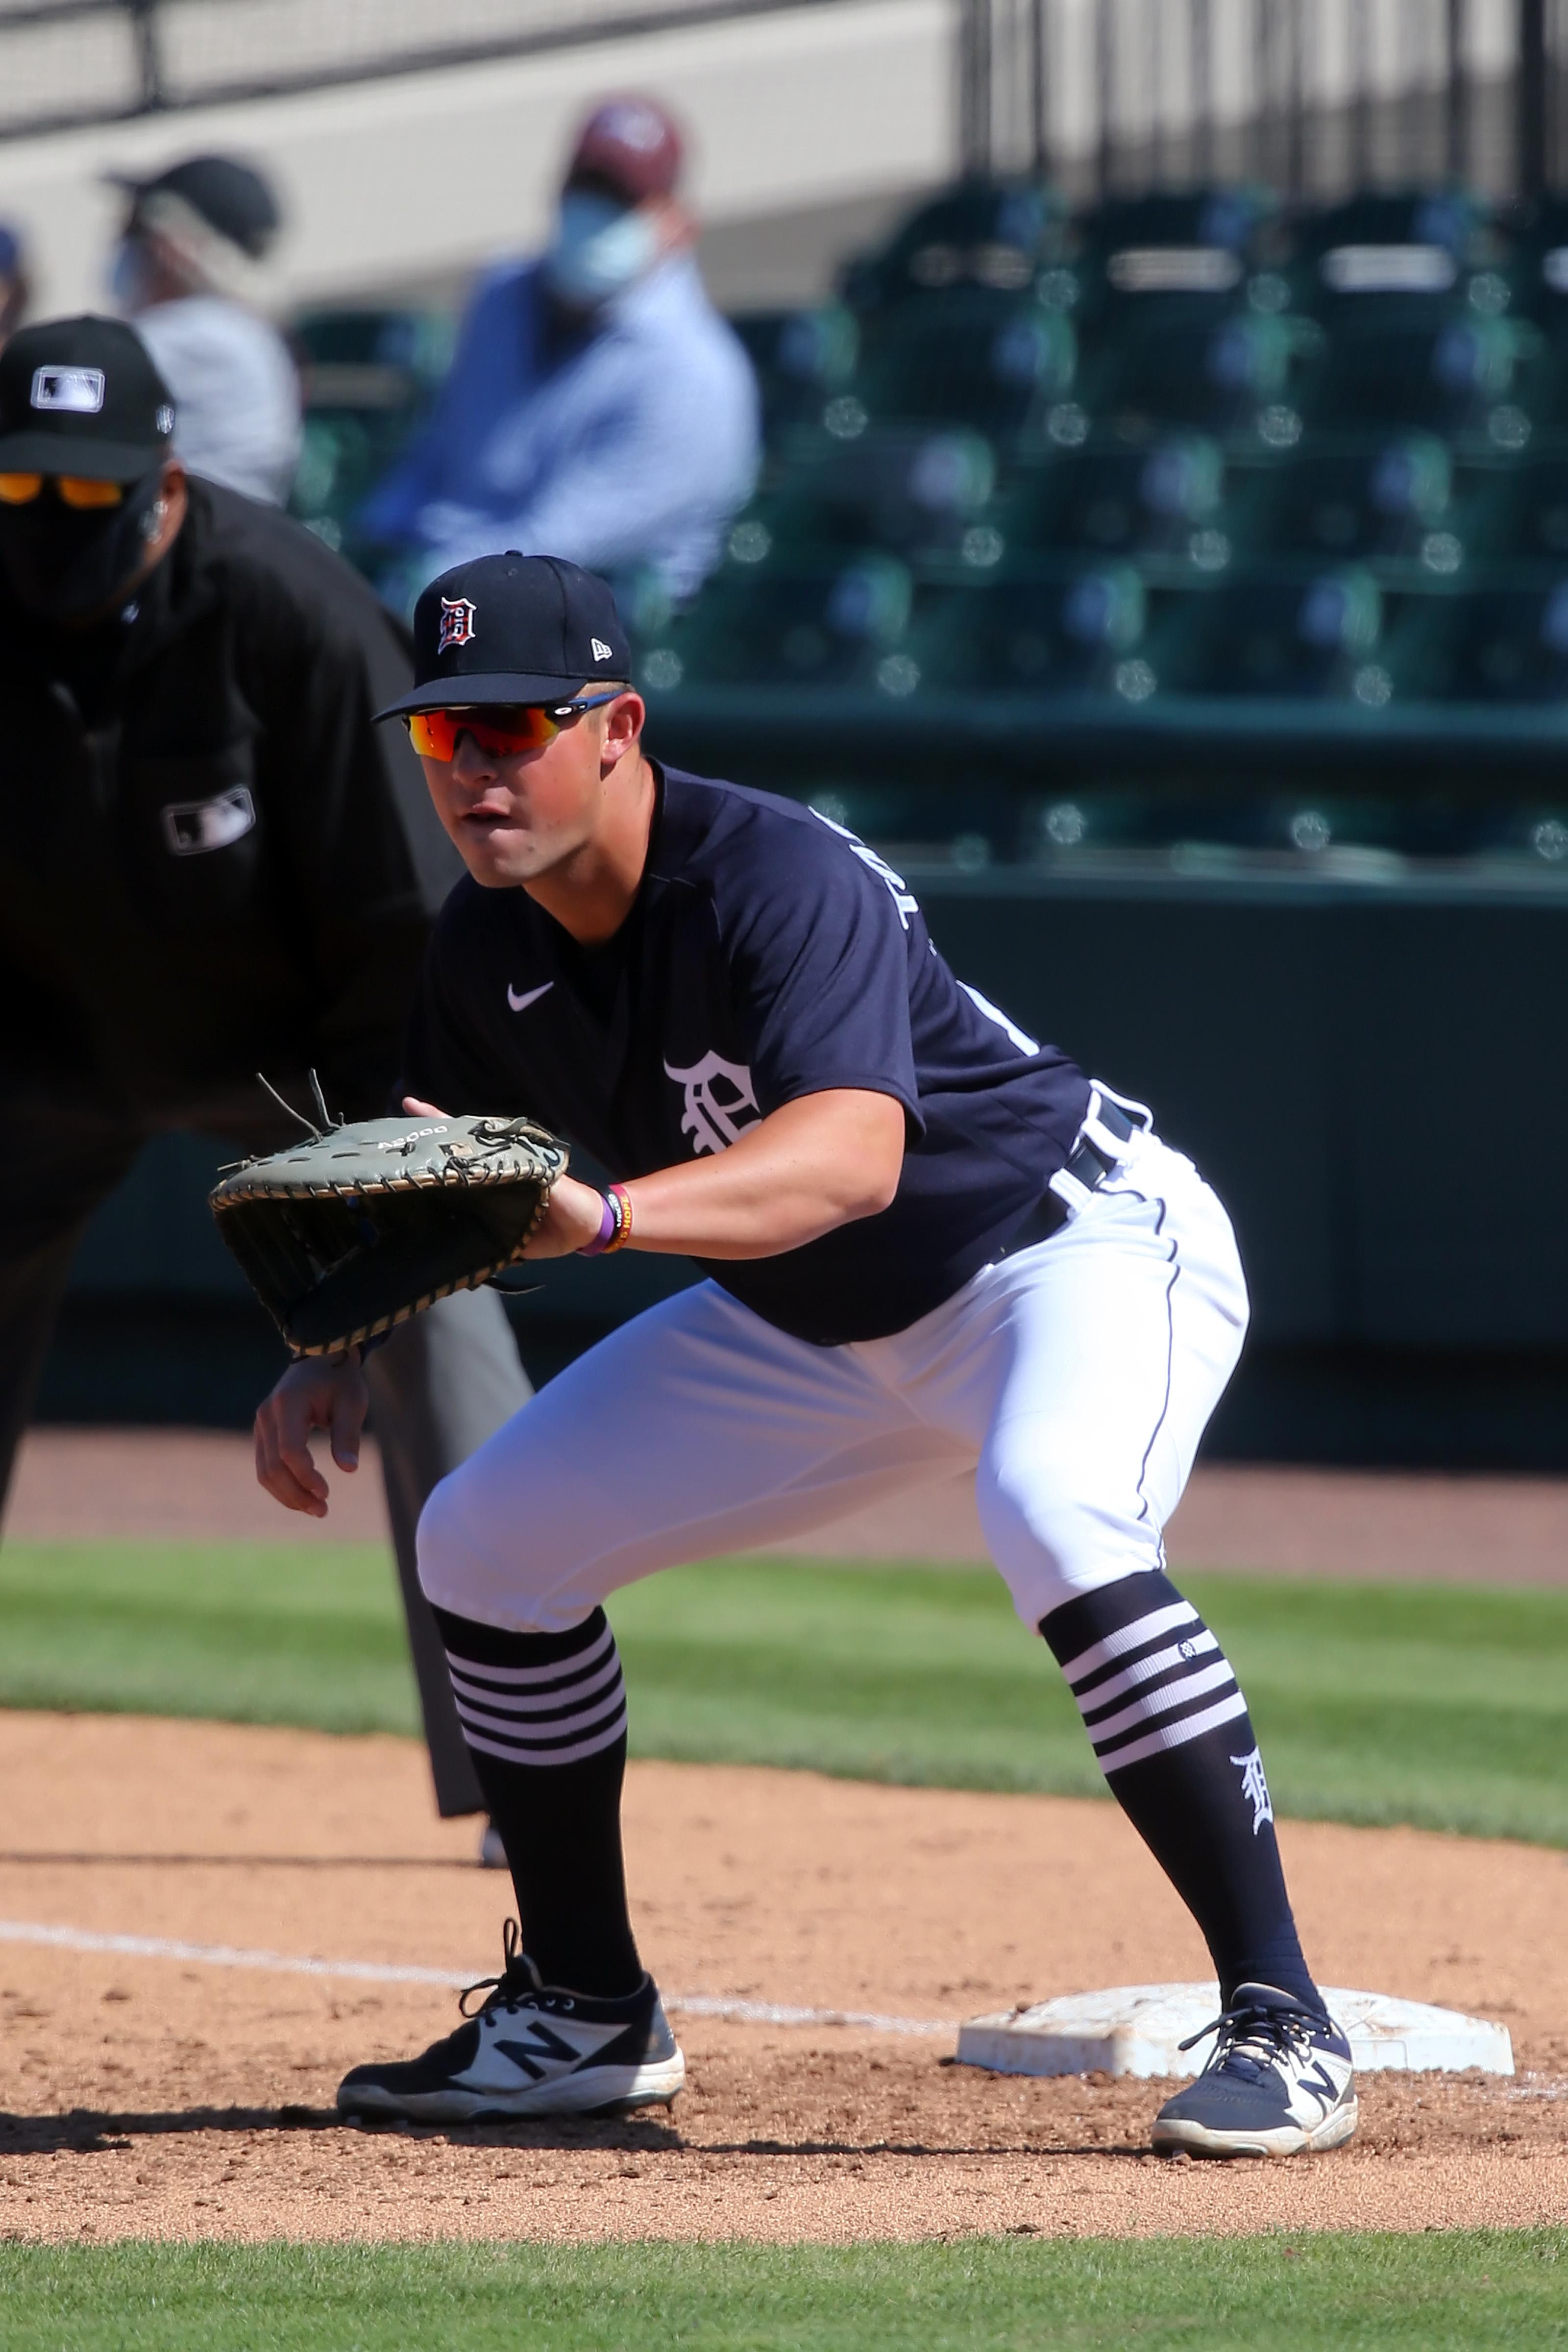 MLB: MAR 07 Blue Jays at Tigers